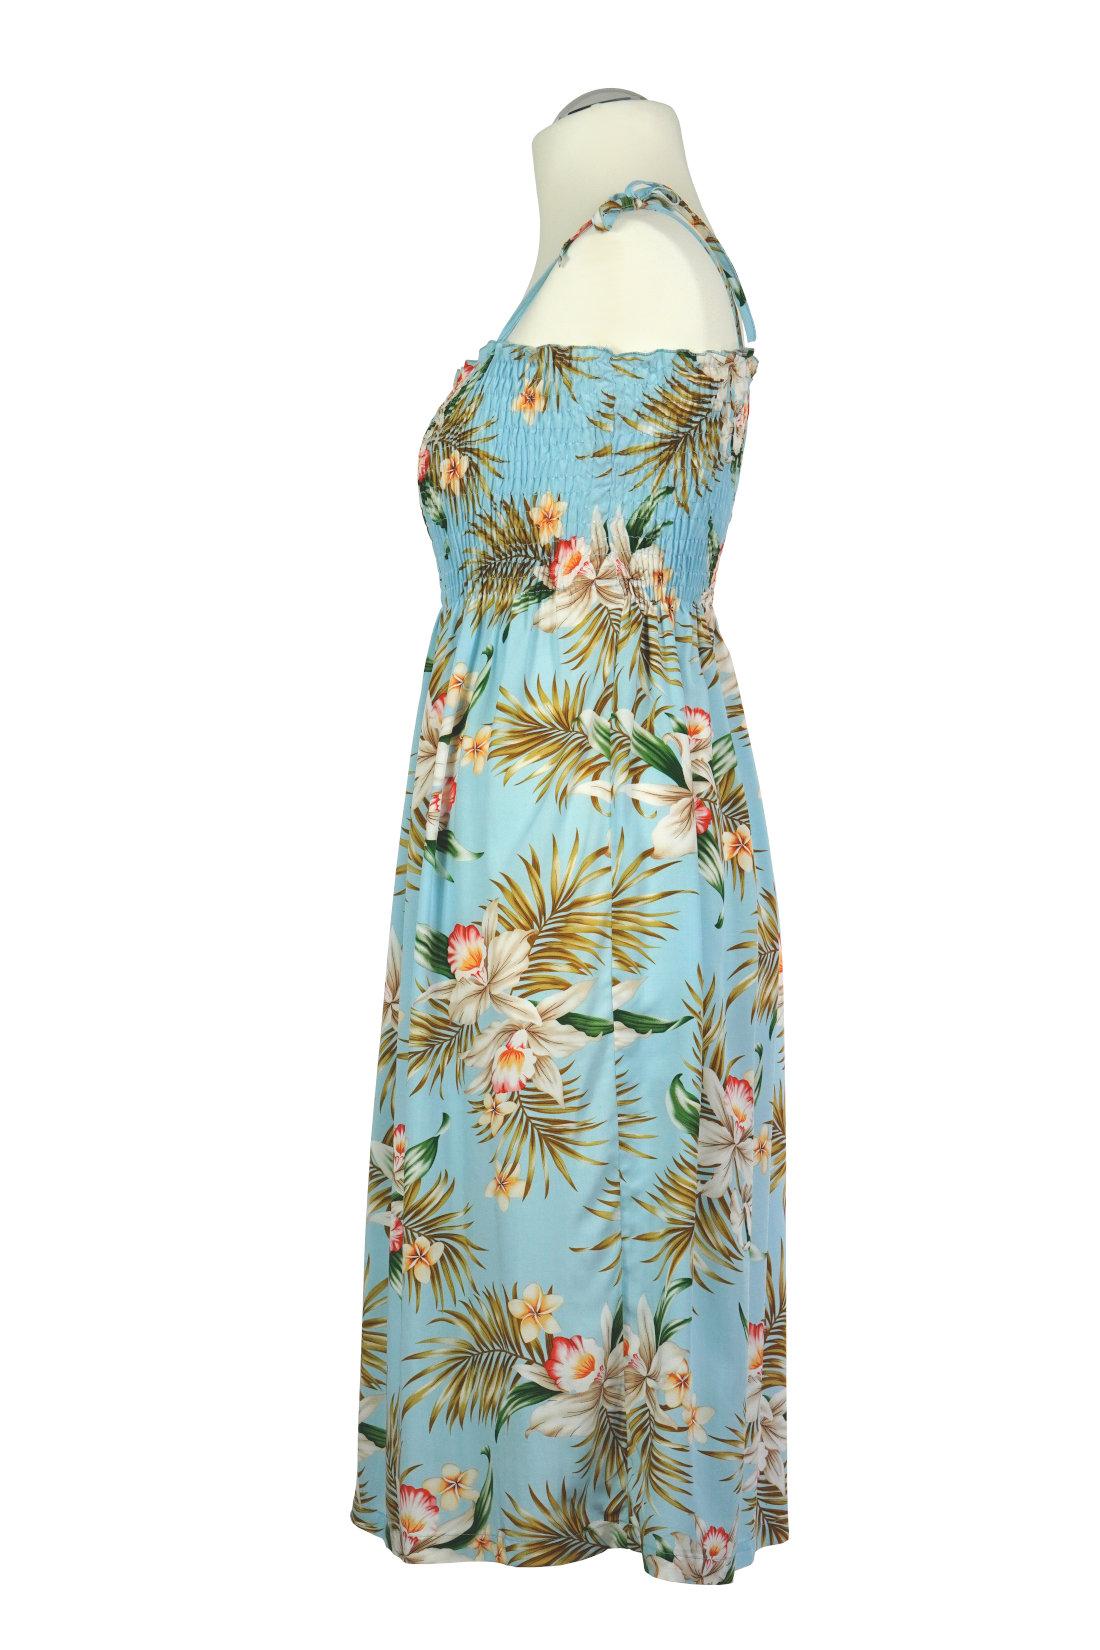 -Summer Breeze - original Hawaii Tube Dress | midi